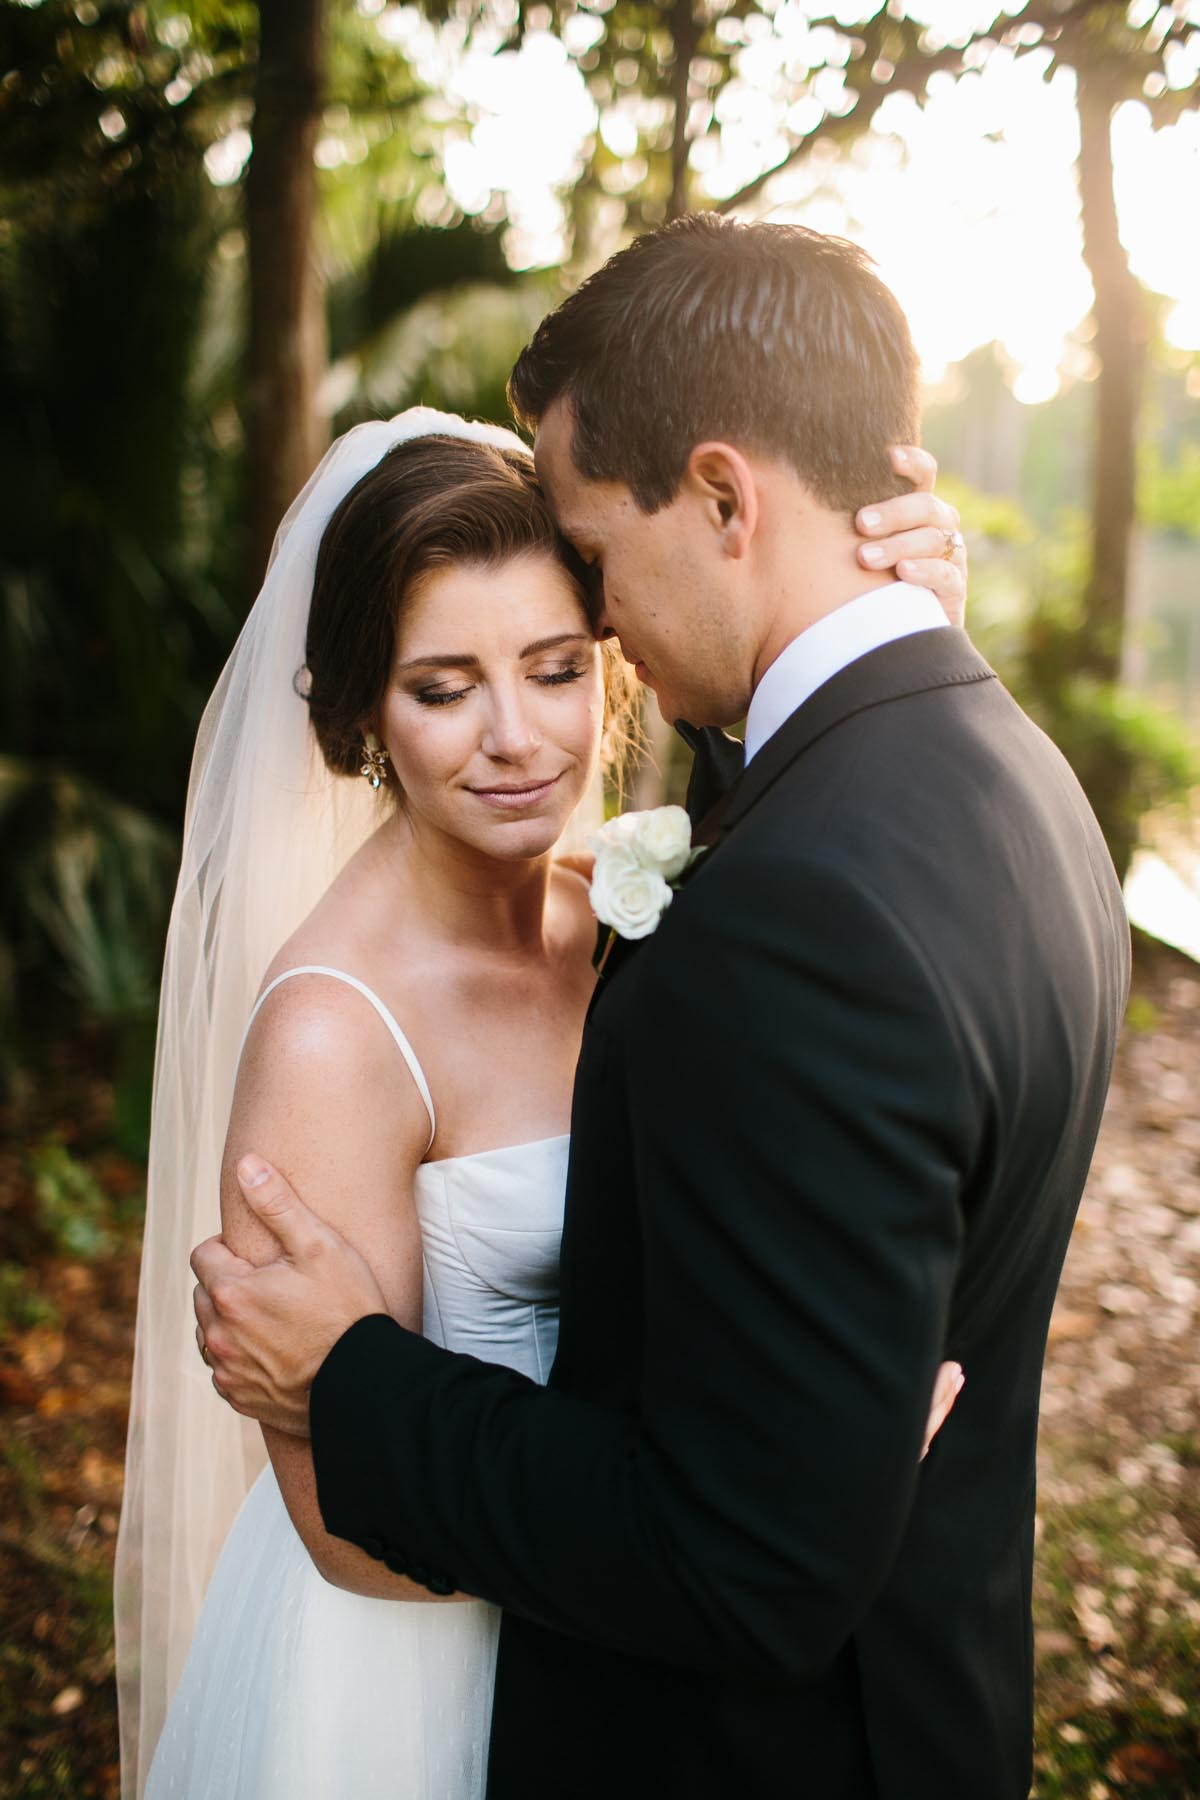 lowry wedding blog eden garden florida wedding-104